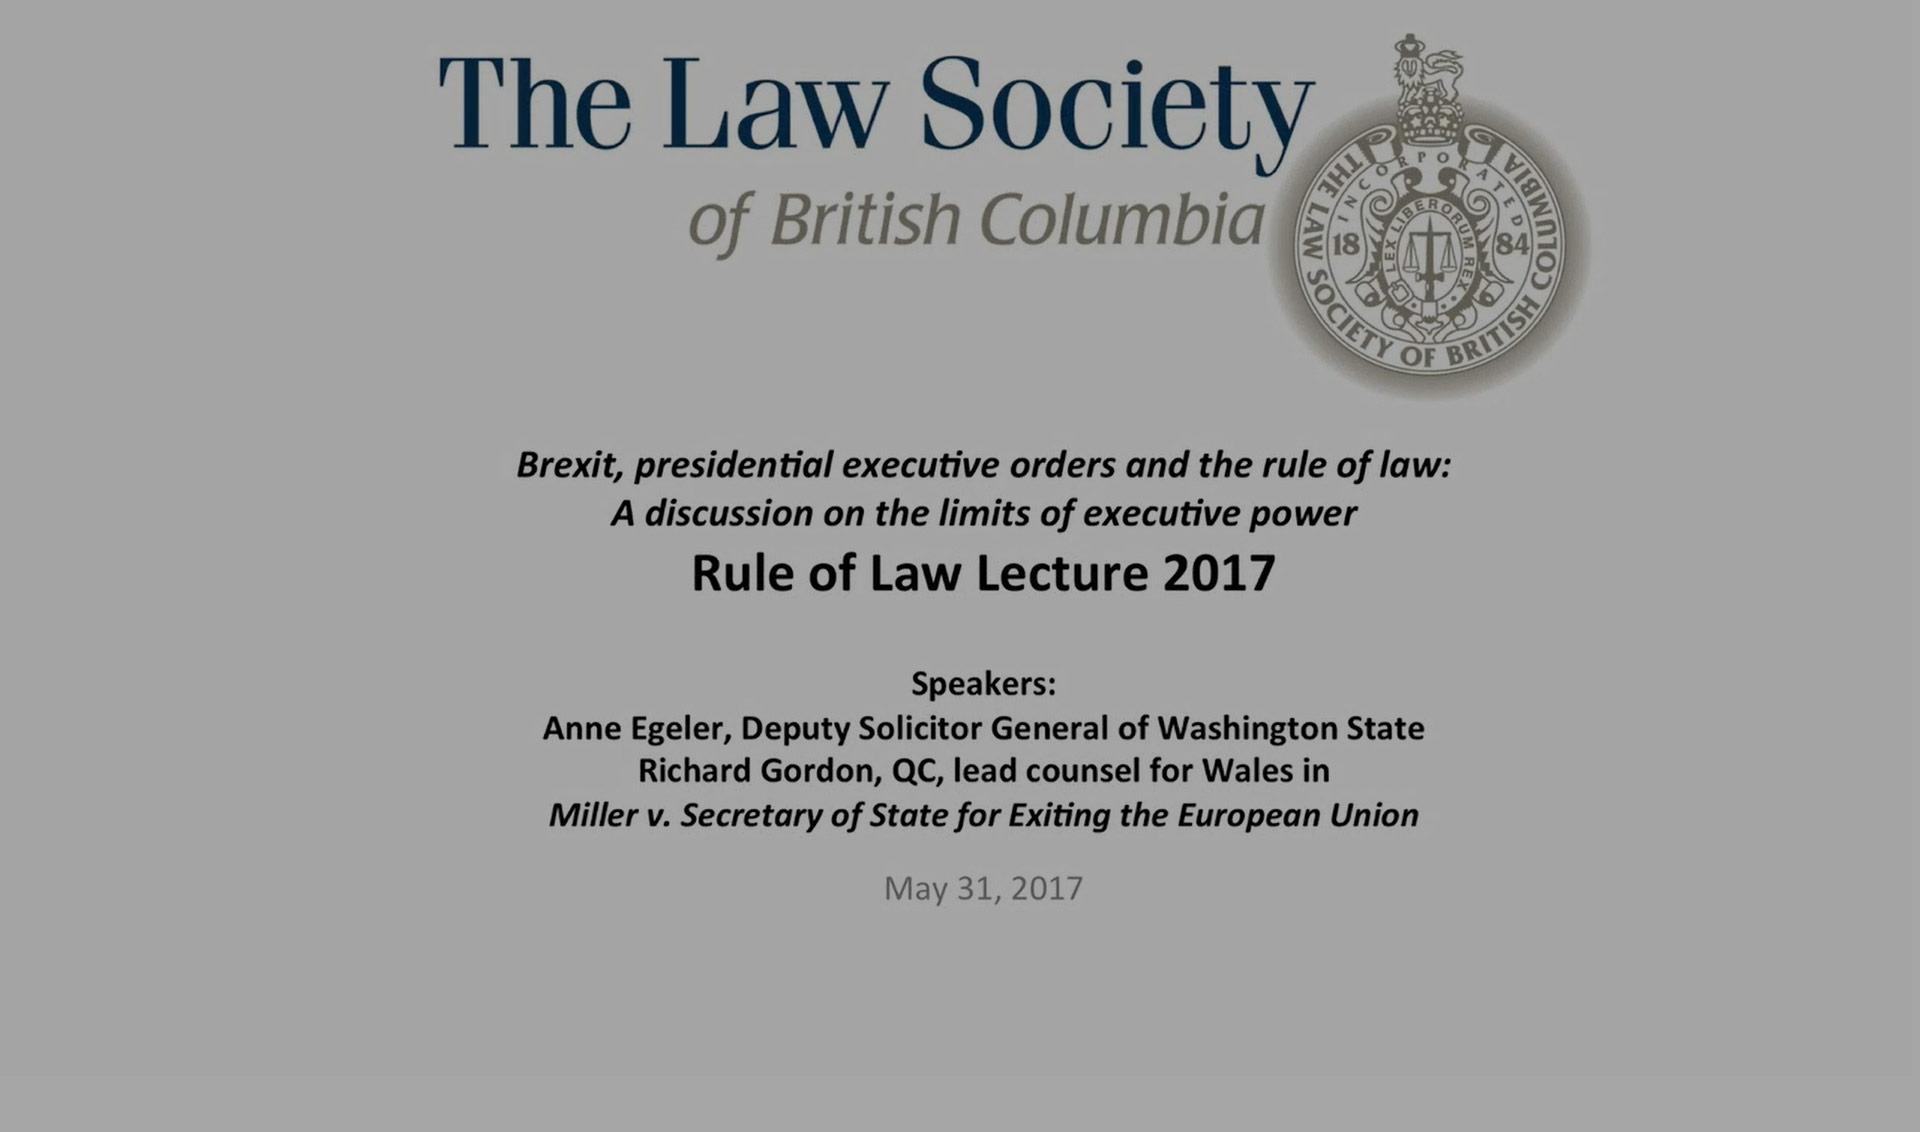 personal development essay law society